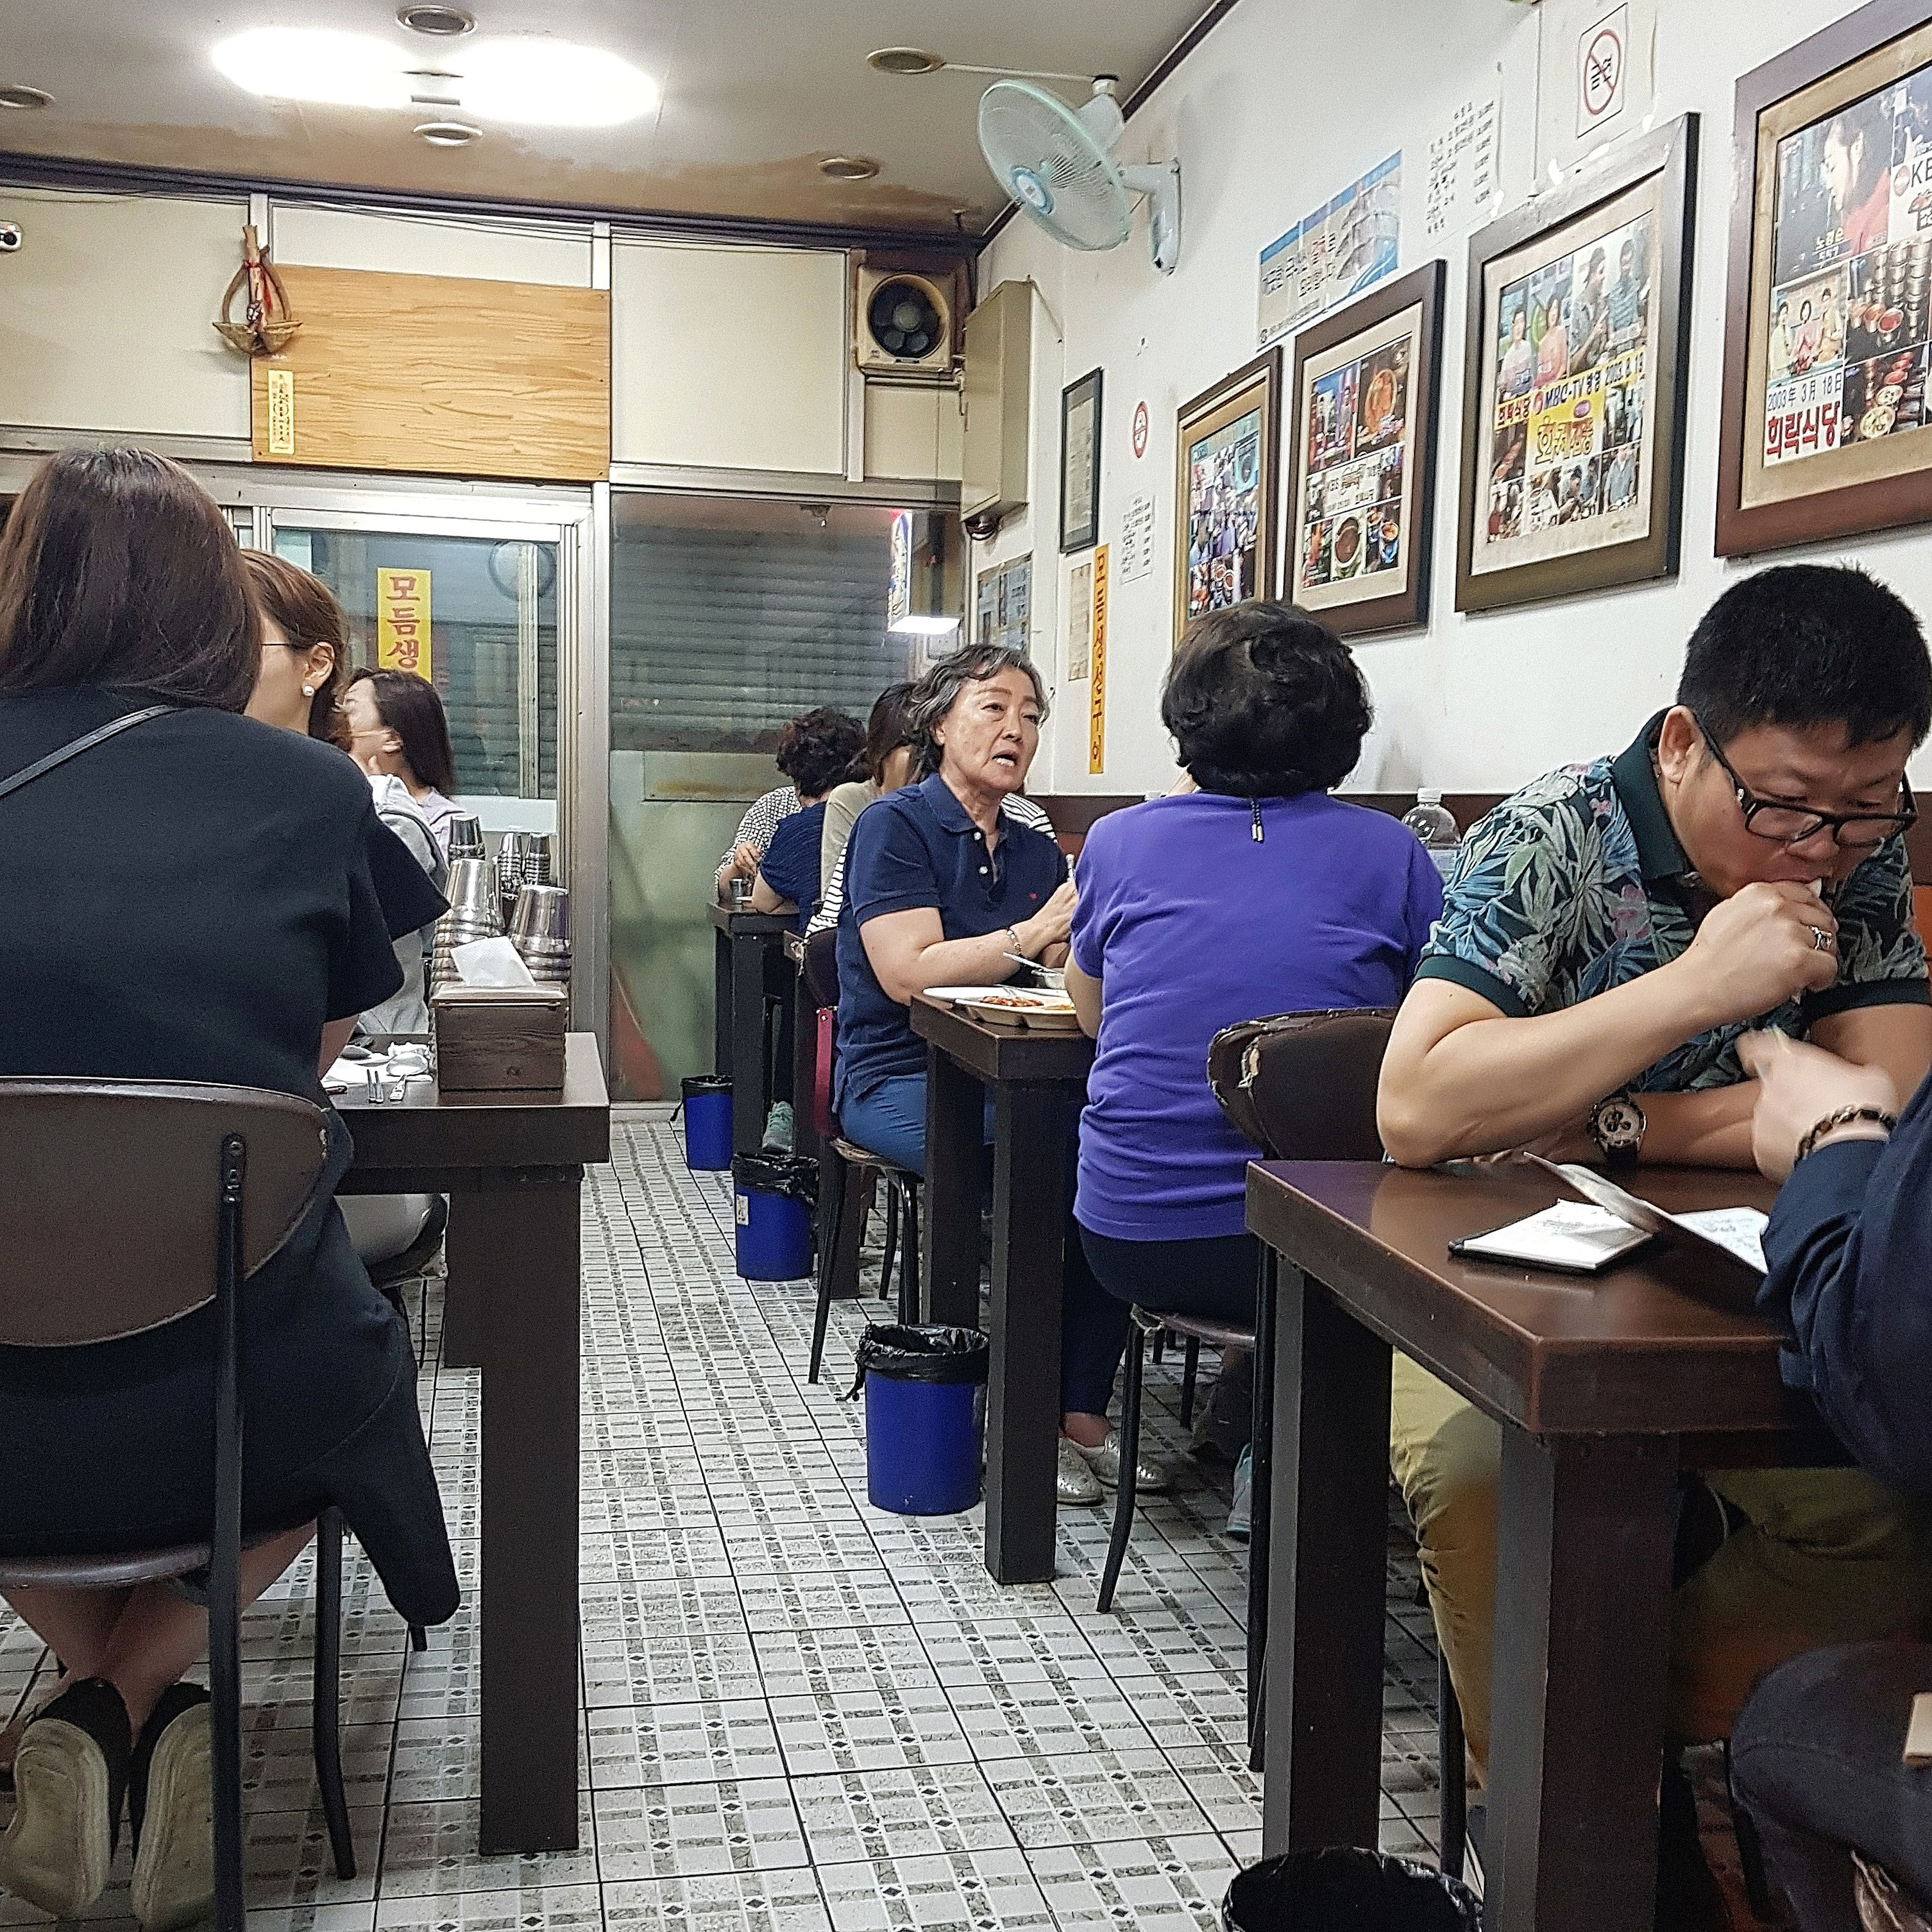 My kind of place Market Food Namdemun Market 1414 Hairtail CutlassFood Alley Streetphotography Seoul Streetphotography Seoul South Korea